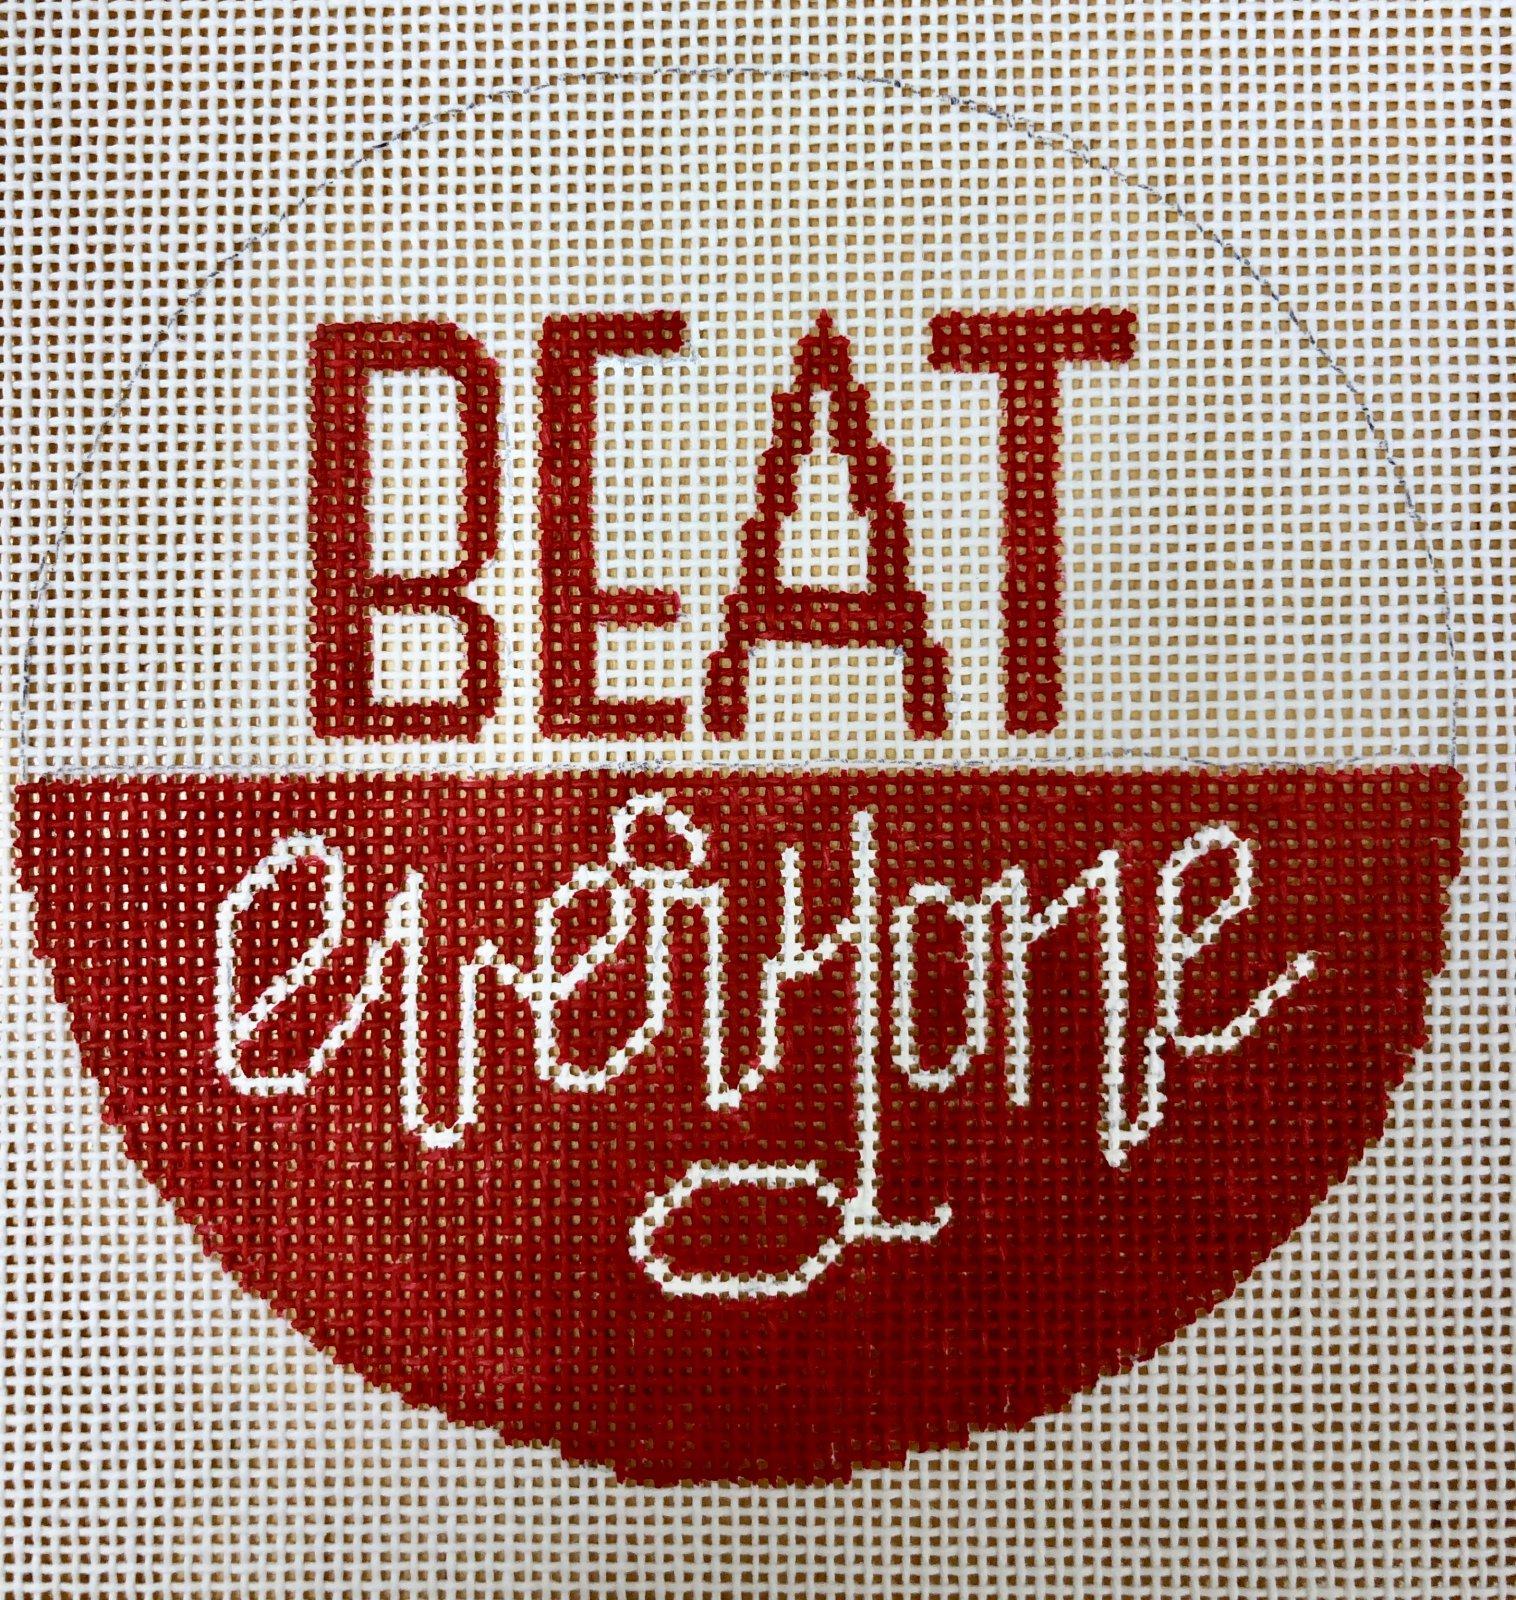 beat everyone, red & white